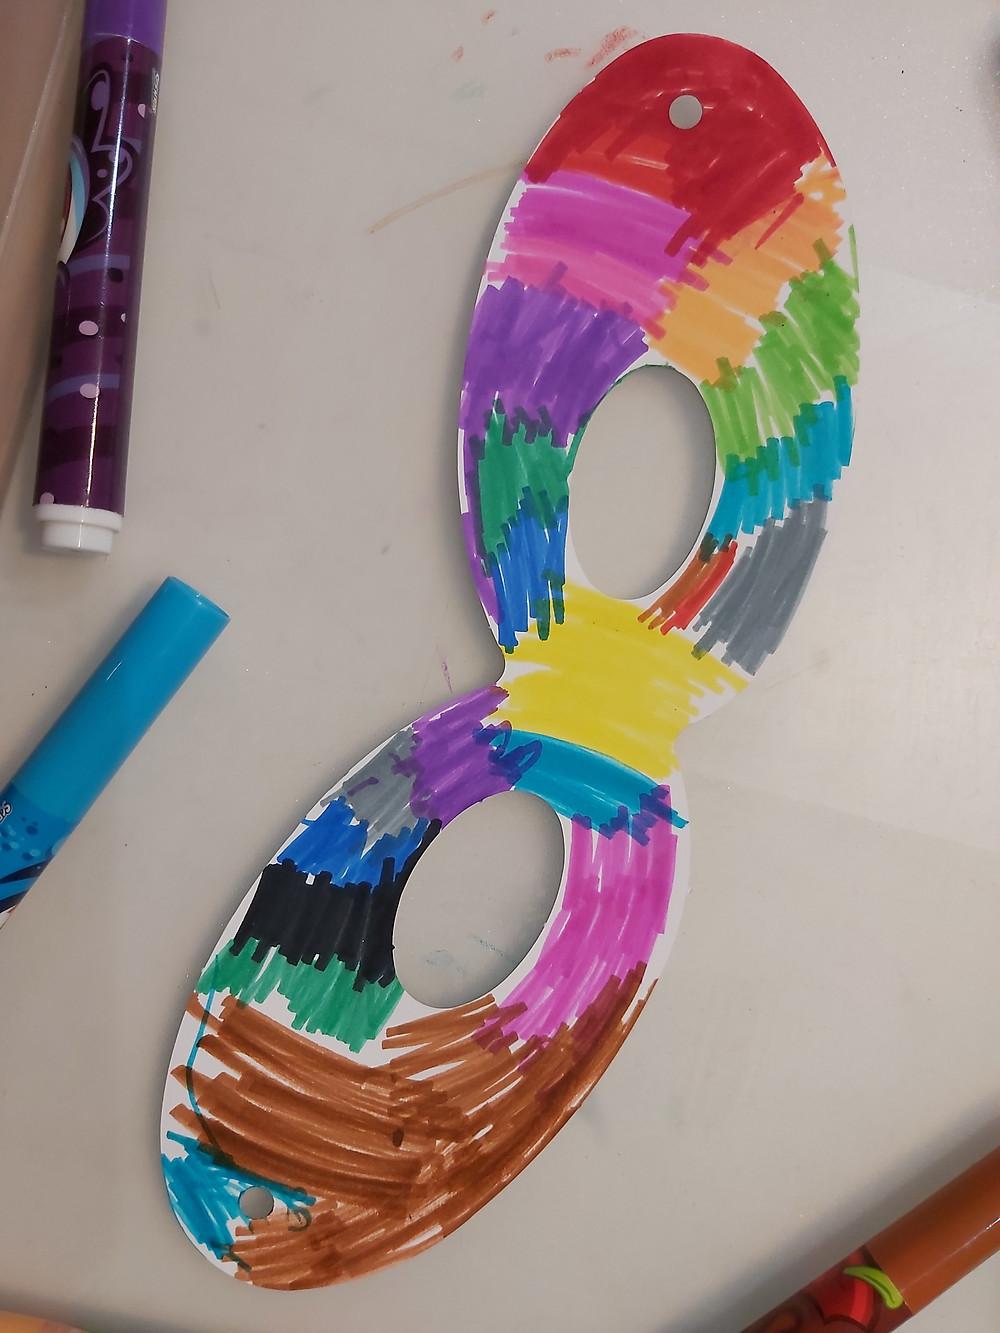 preschooler's finished superhero mask